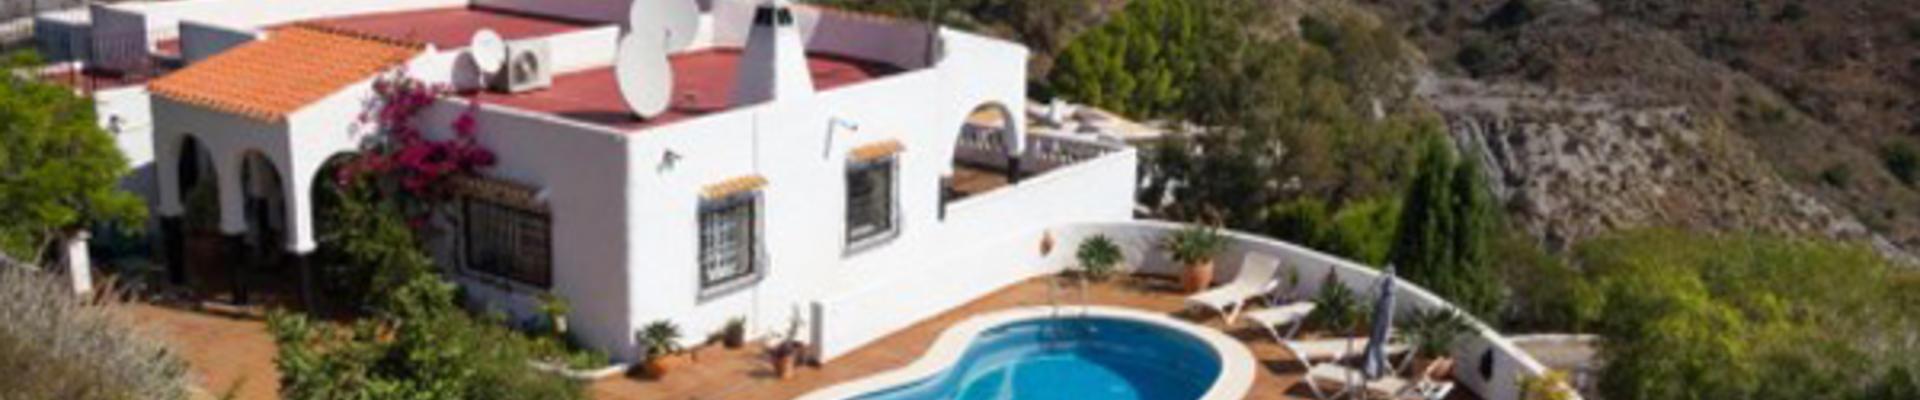 RENMojacar: 4 Bedroom Villa for Rent